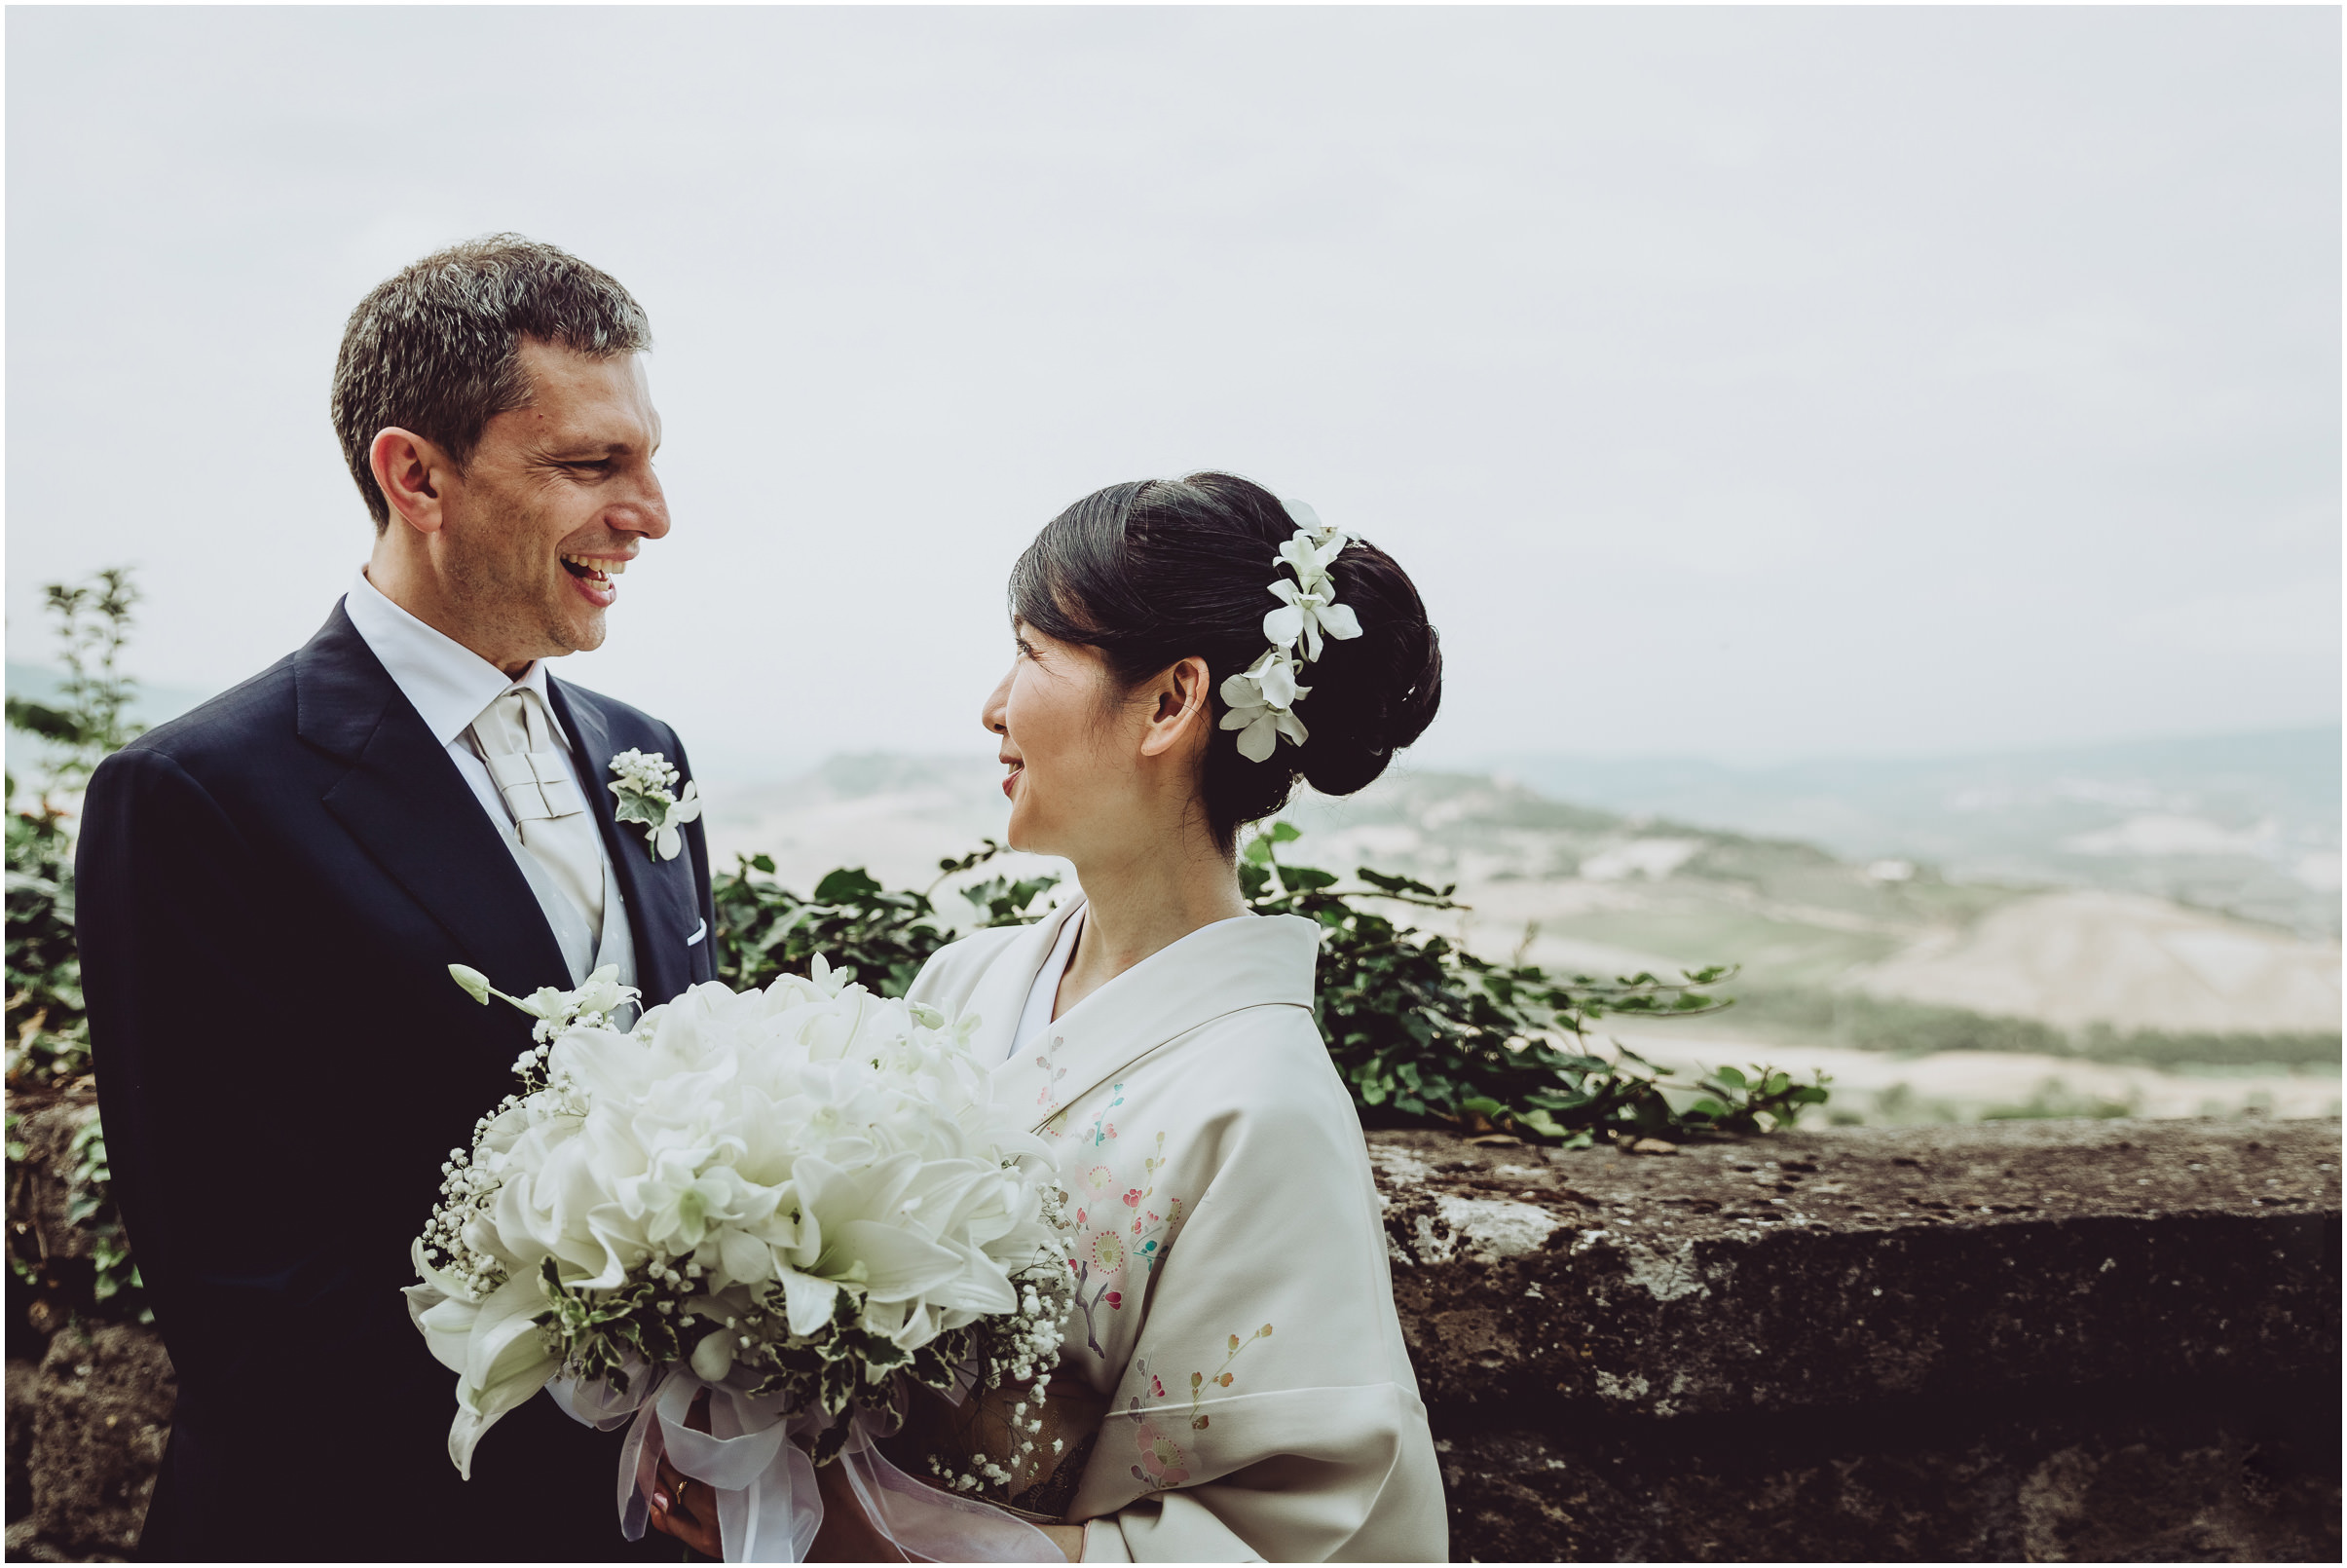 WEDDING-PHOTOGRAPHY-SARA-LORENZONI-FOTOGRAFIA-MATRIMONIO-ORVIETO-JUKA-ANTONELLO31